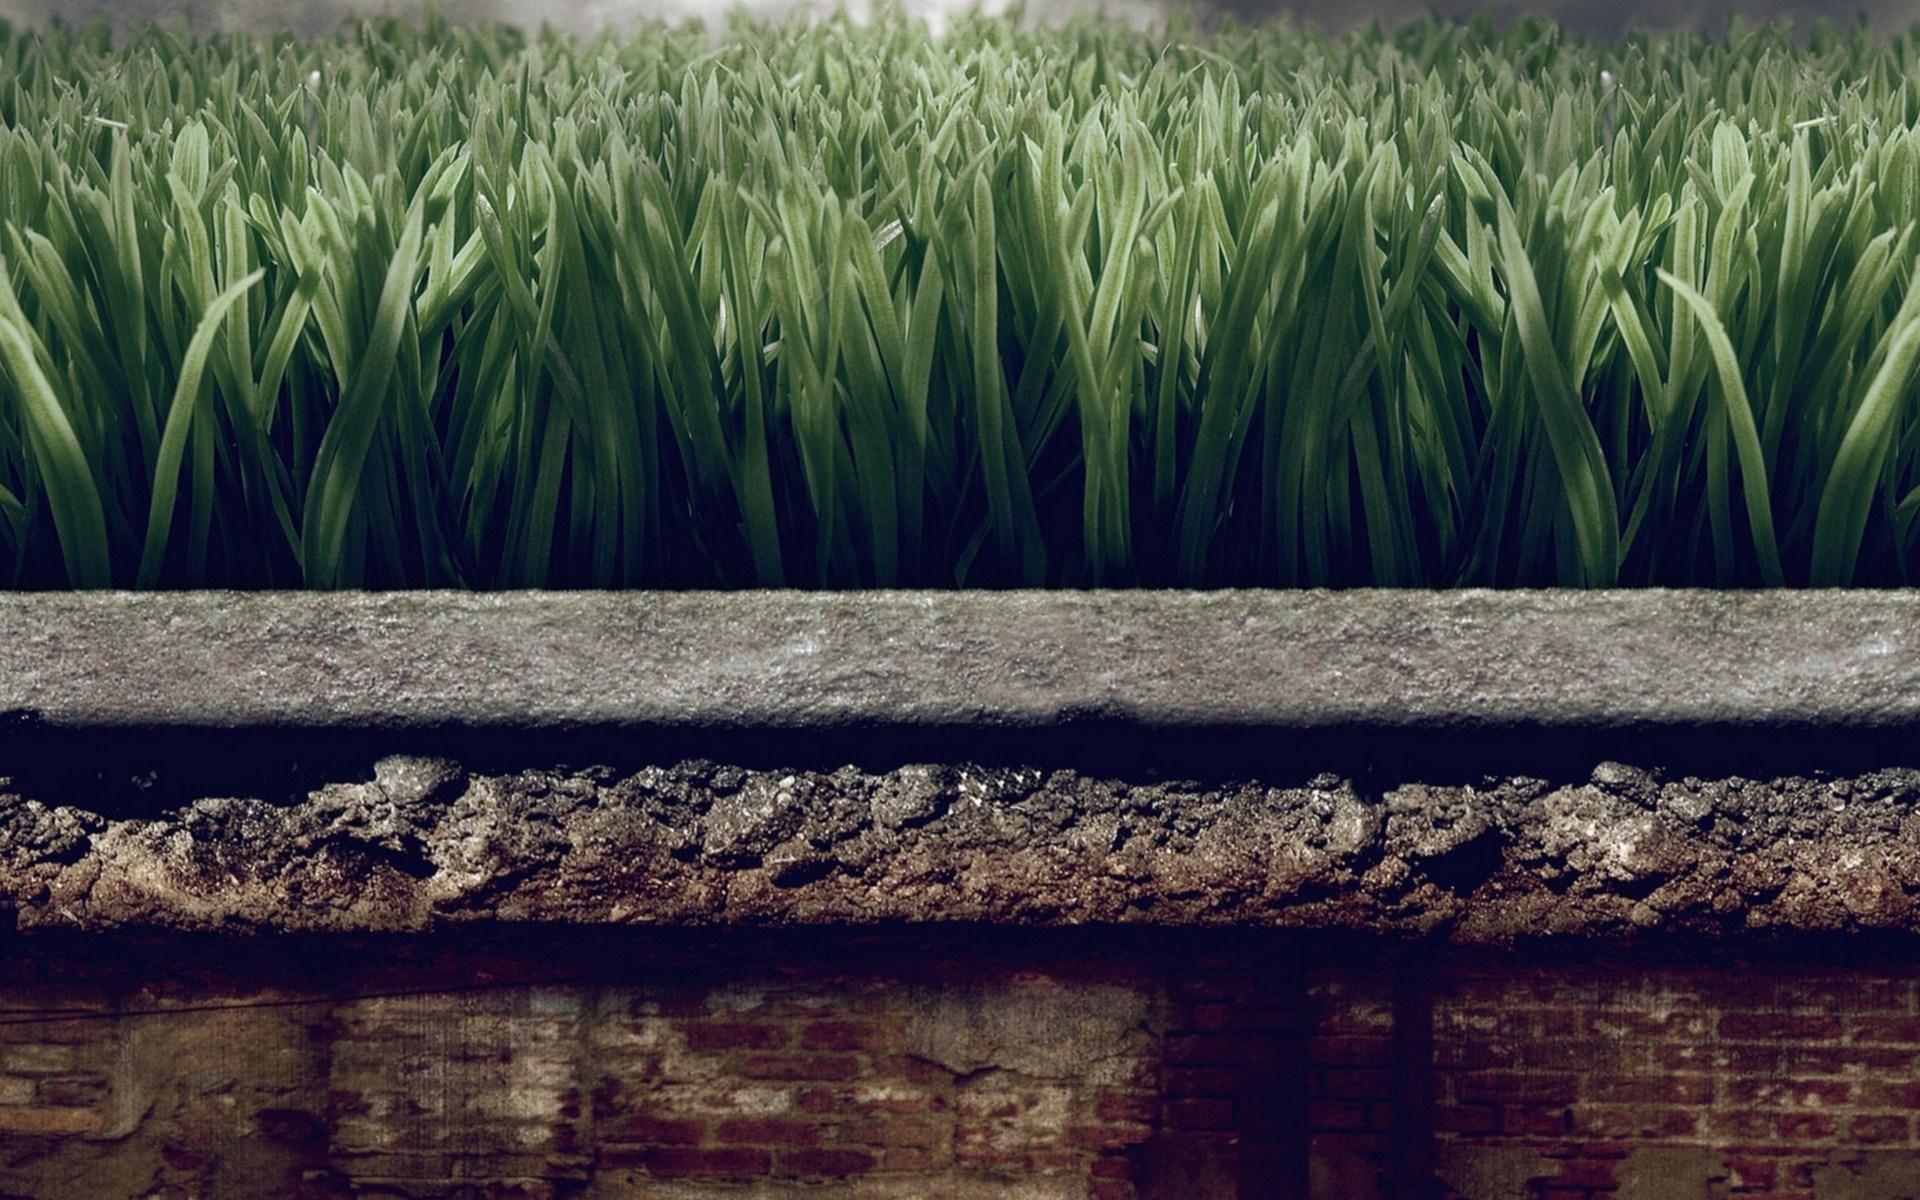 Wall Grass Turf Close-Up Photo